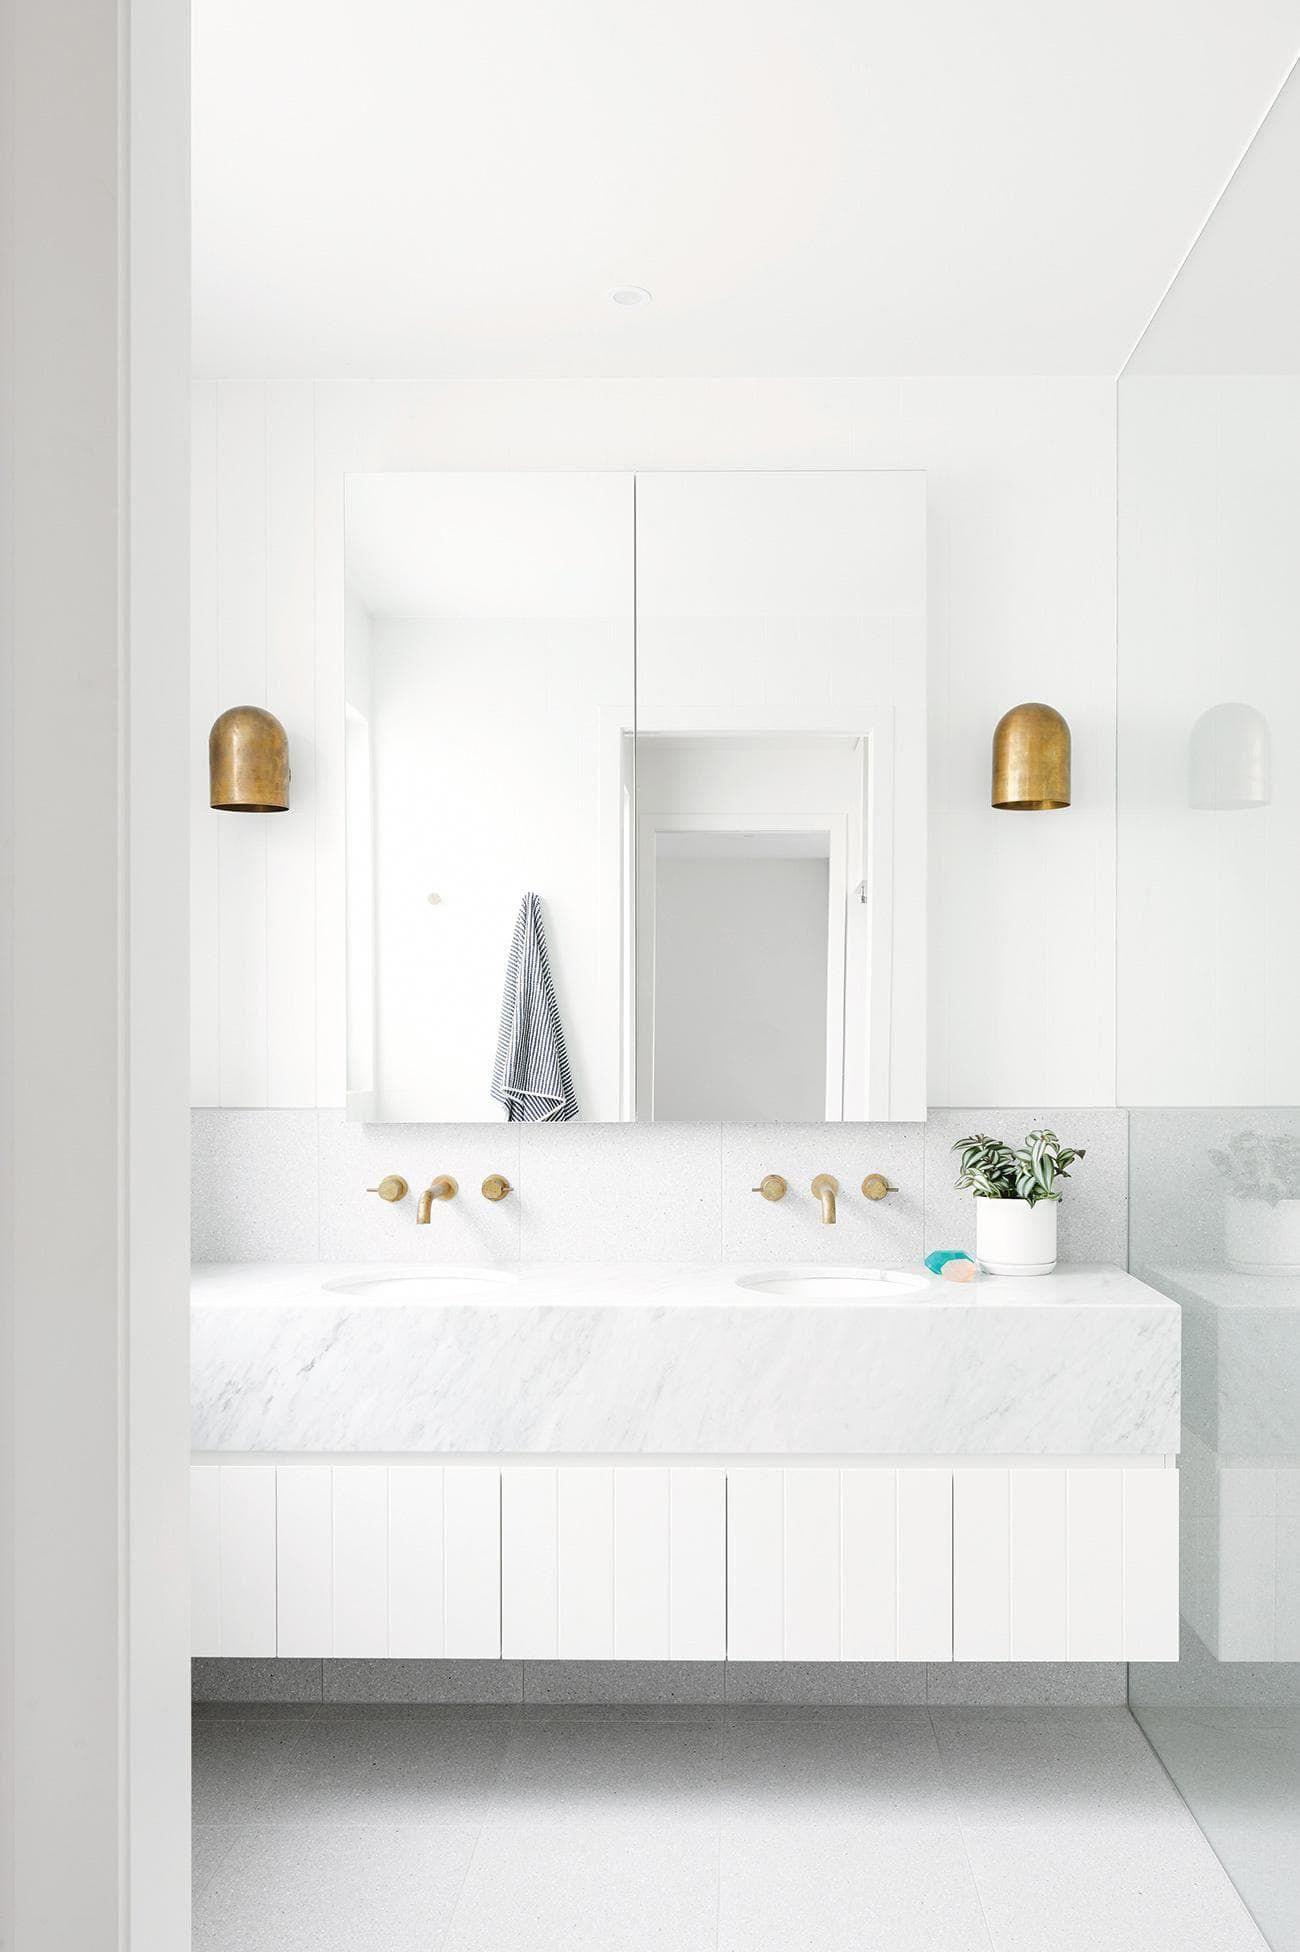 Dorf badezimmer design pin by spaceimproved on modern bathroom ideas in   pinterest